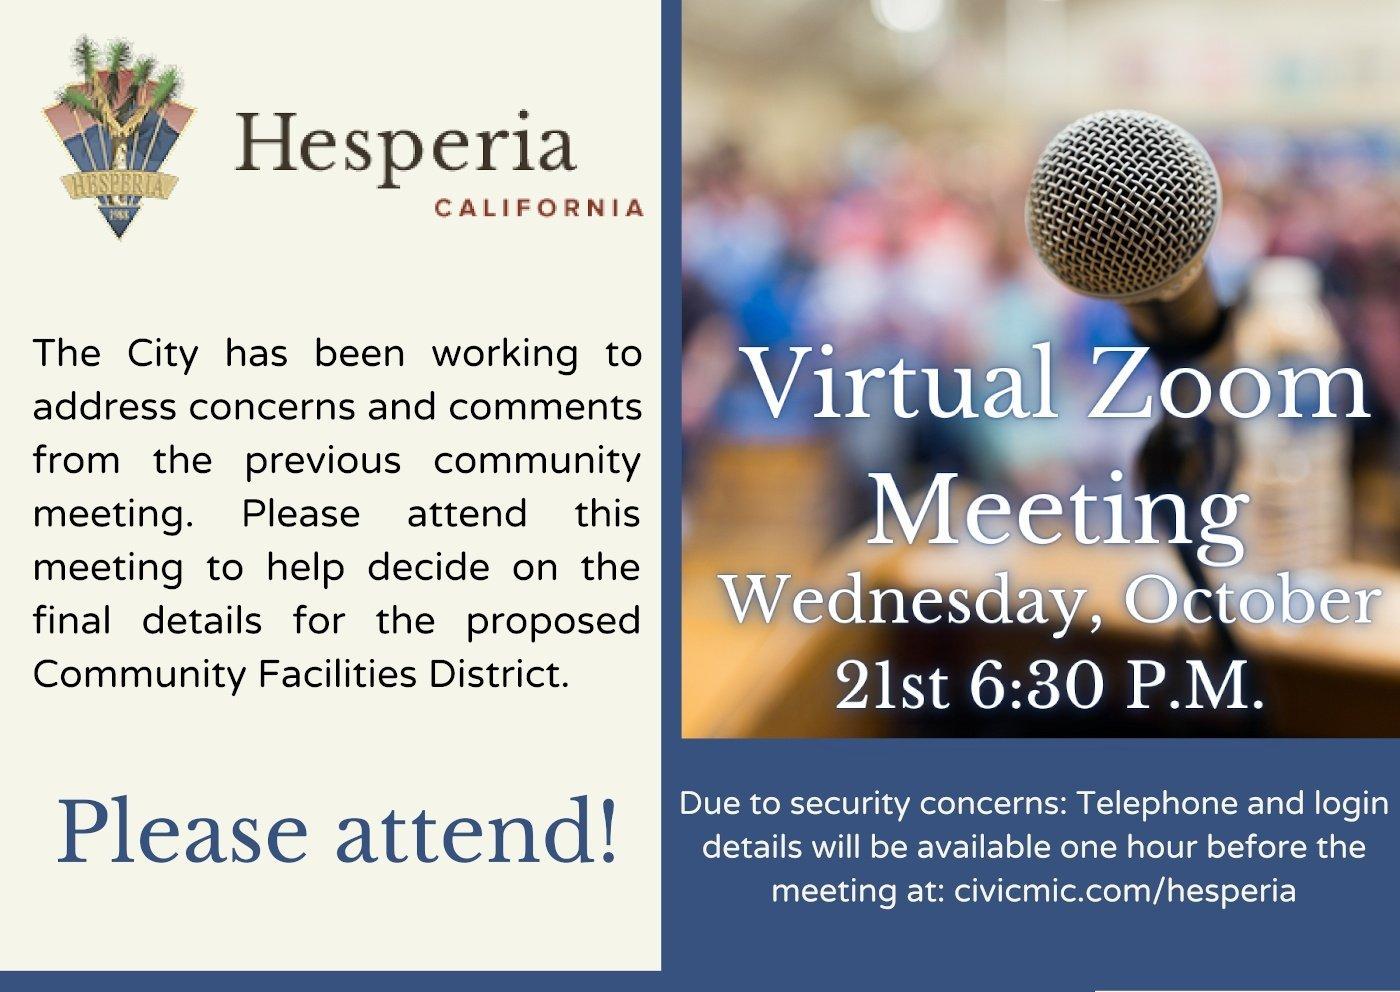 Hesperia Community Meeting - Hesperia Golf & Country Club